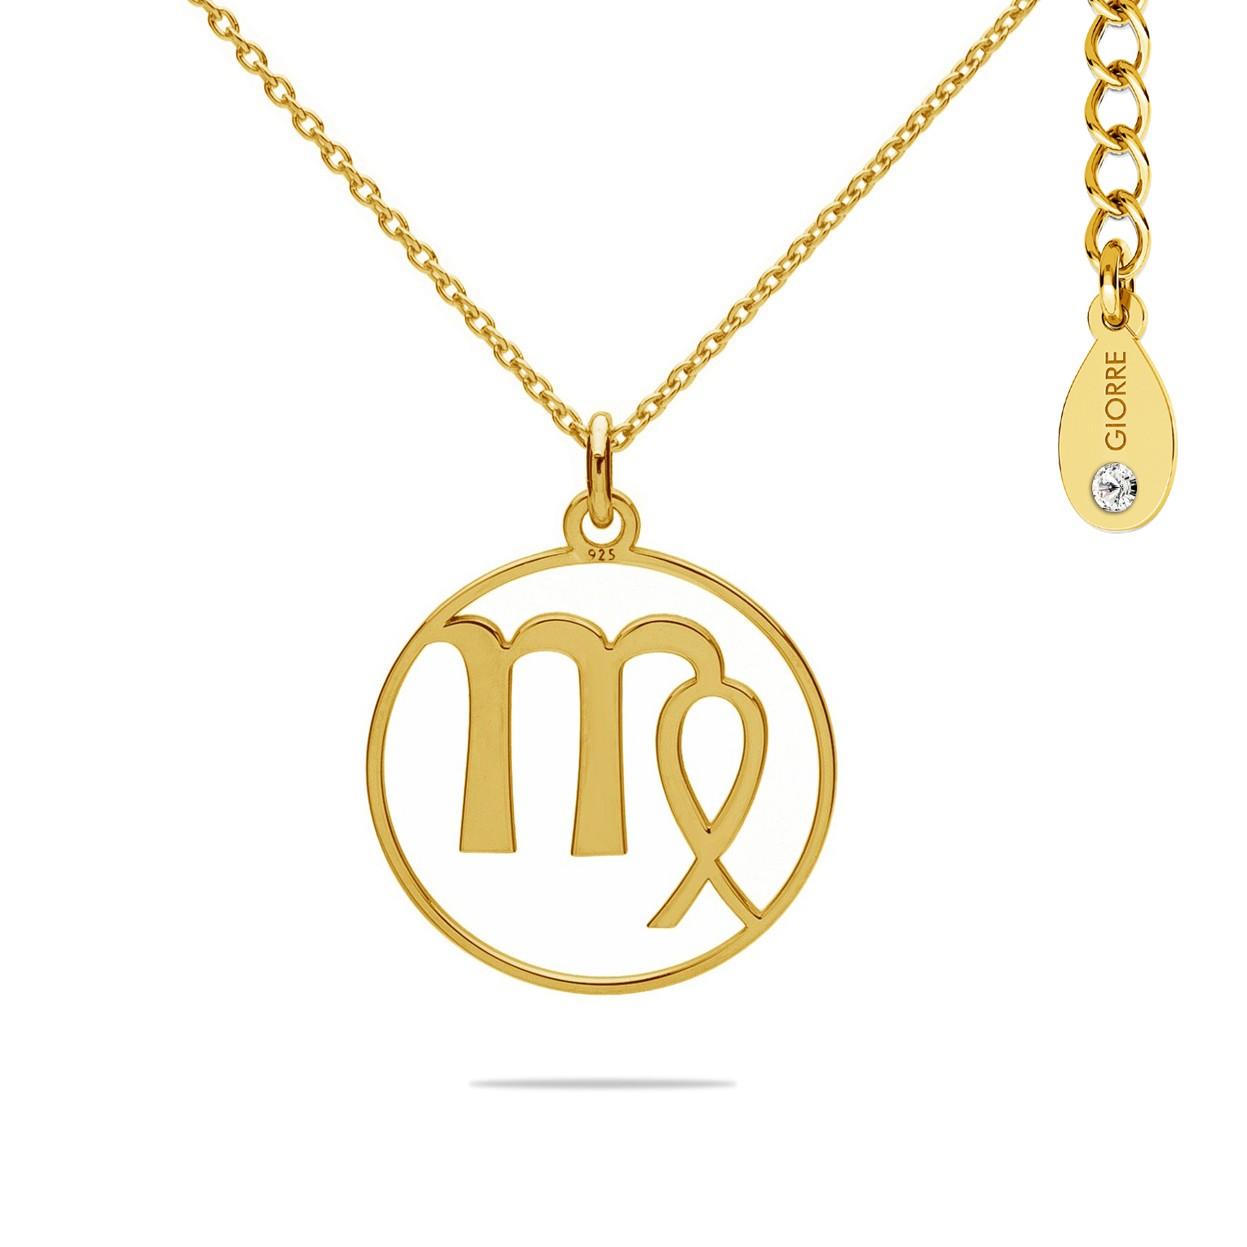 VIRGO zodiac sign necklace with Swarovski Crystals sterling silver 925